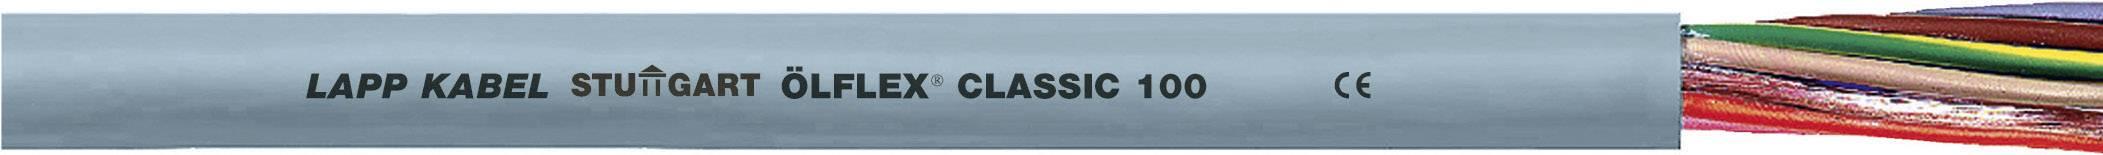 Kabel LappKabel Ölflex CLASSIC 100 4G25 (00101153), PVC, 25,4 mm, 750 V, šedá, 300 m